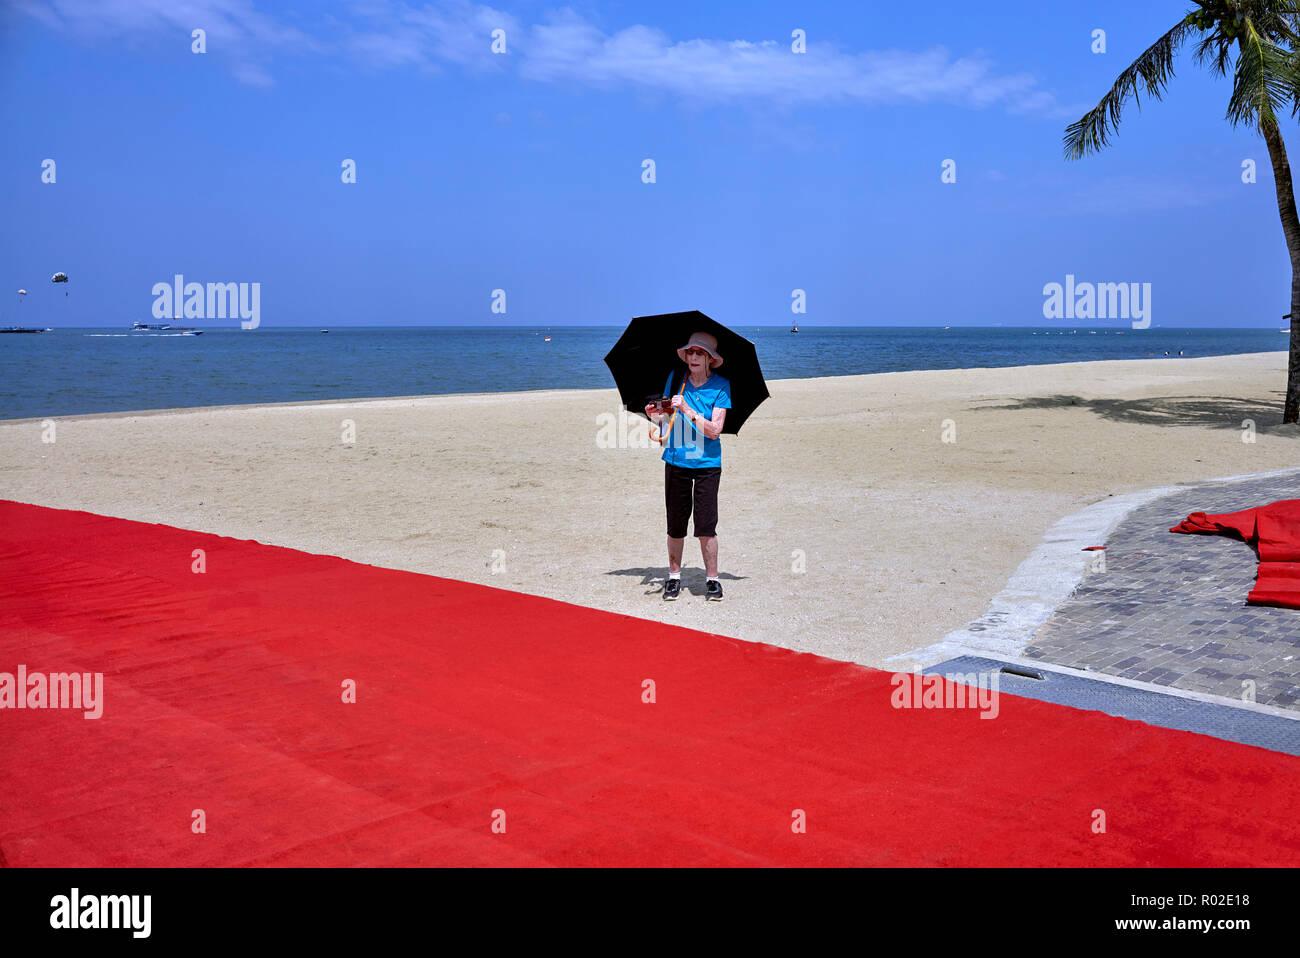 woman-beach-alone-red-carpet-pattaya-bea